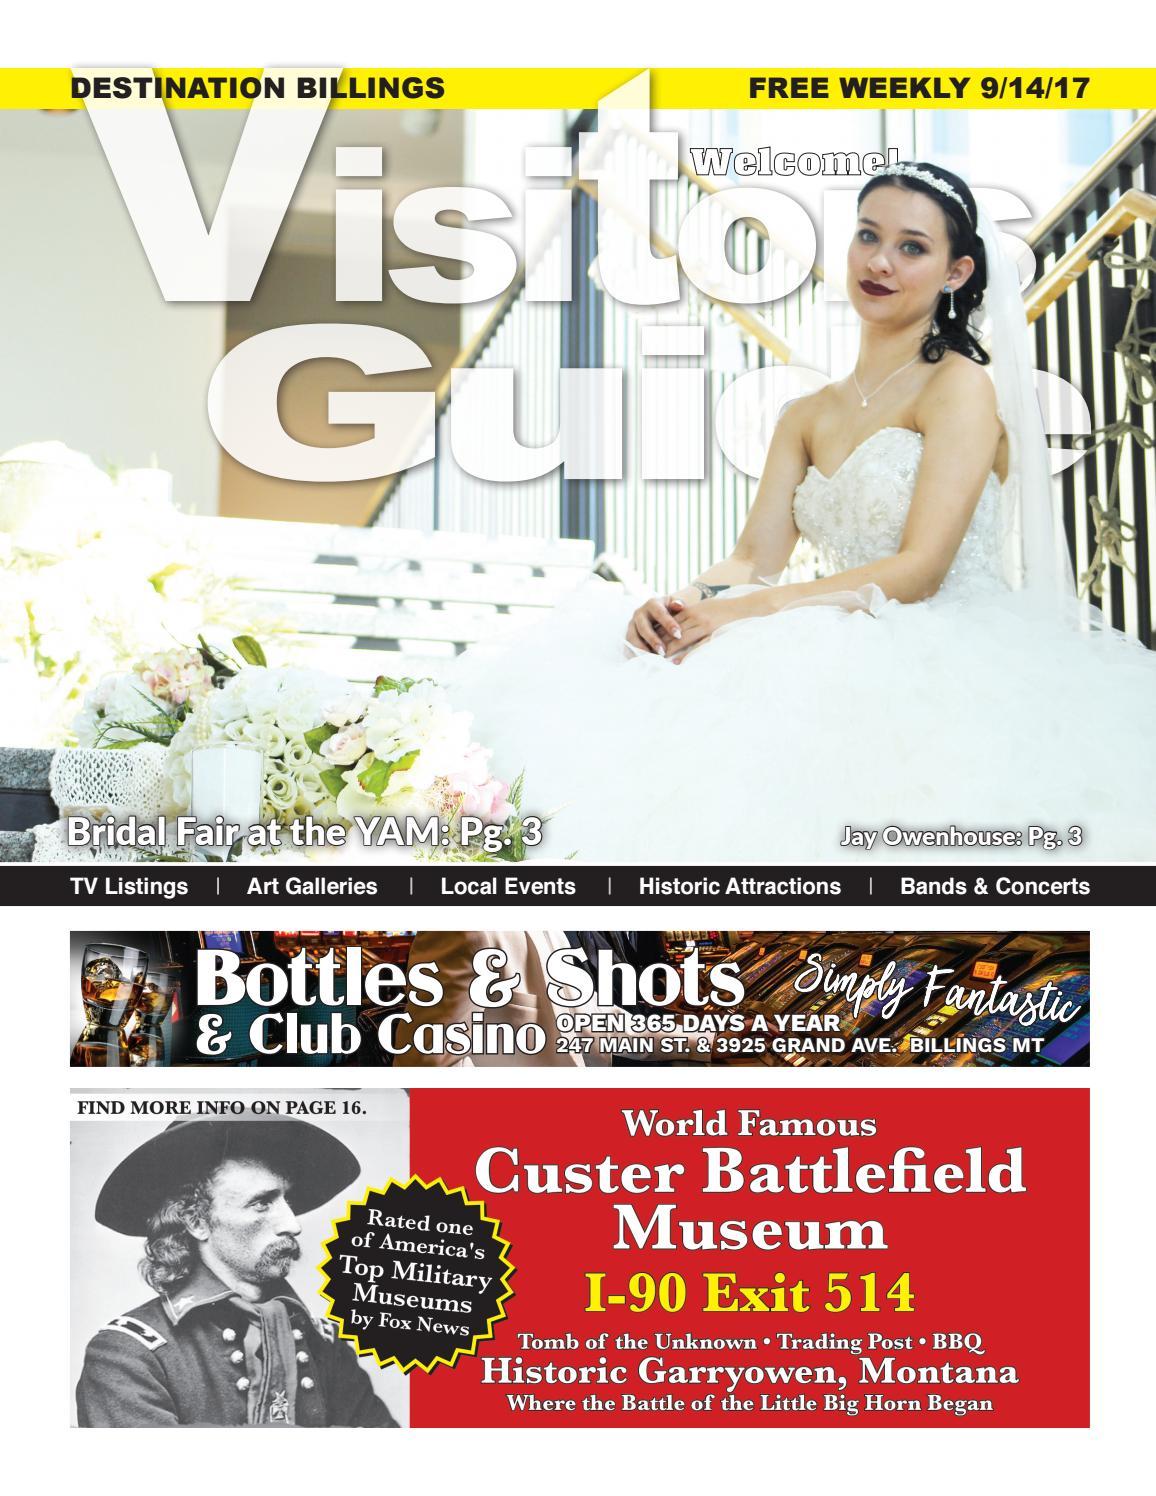 Welcome! Visitors Guide 17-9-14 by Welcome! Visitors Guide